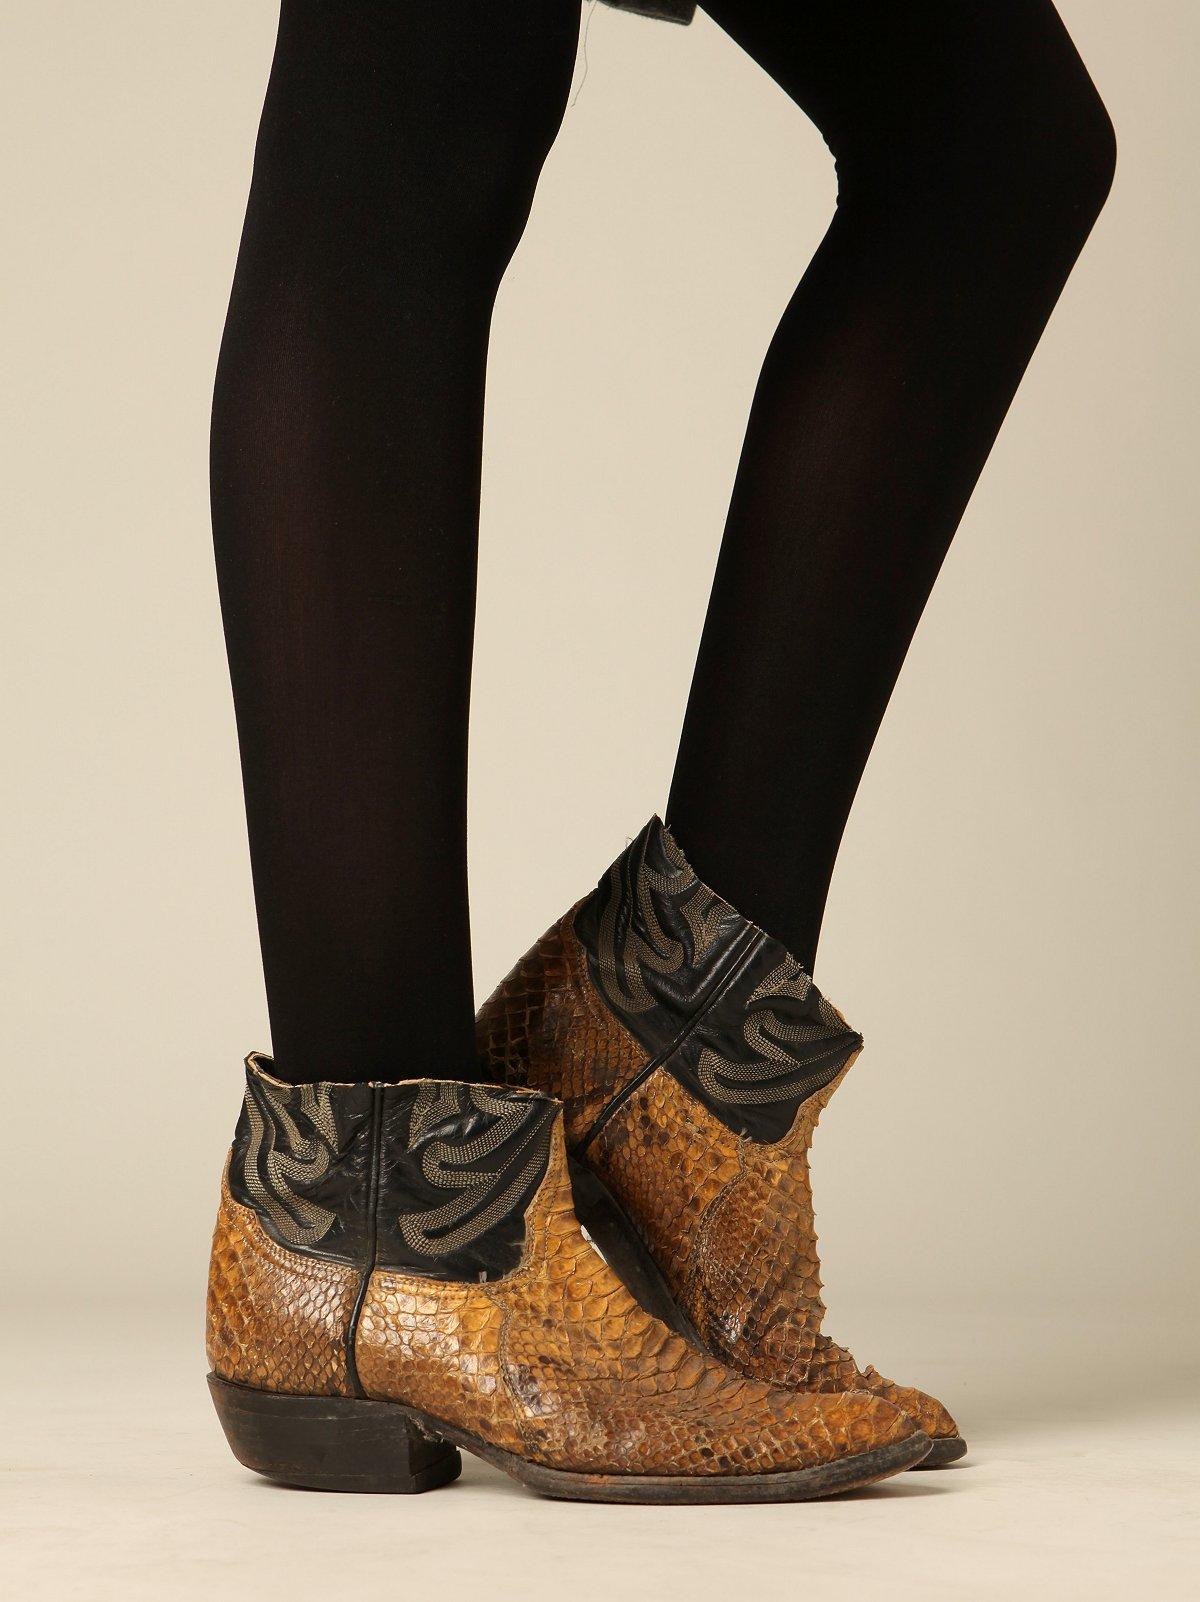 Vintage Cutoff Snake Boots